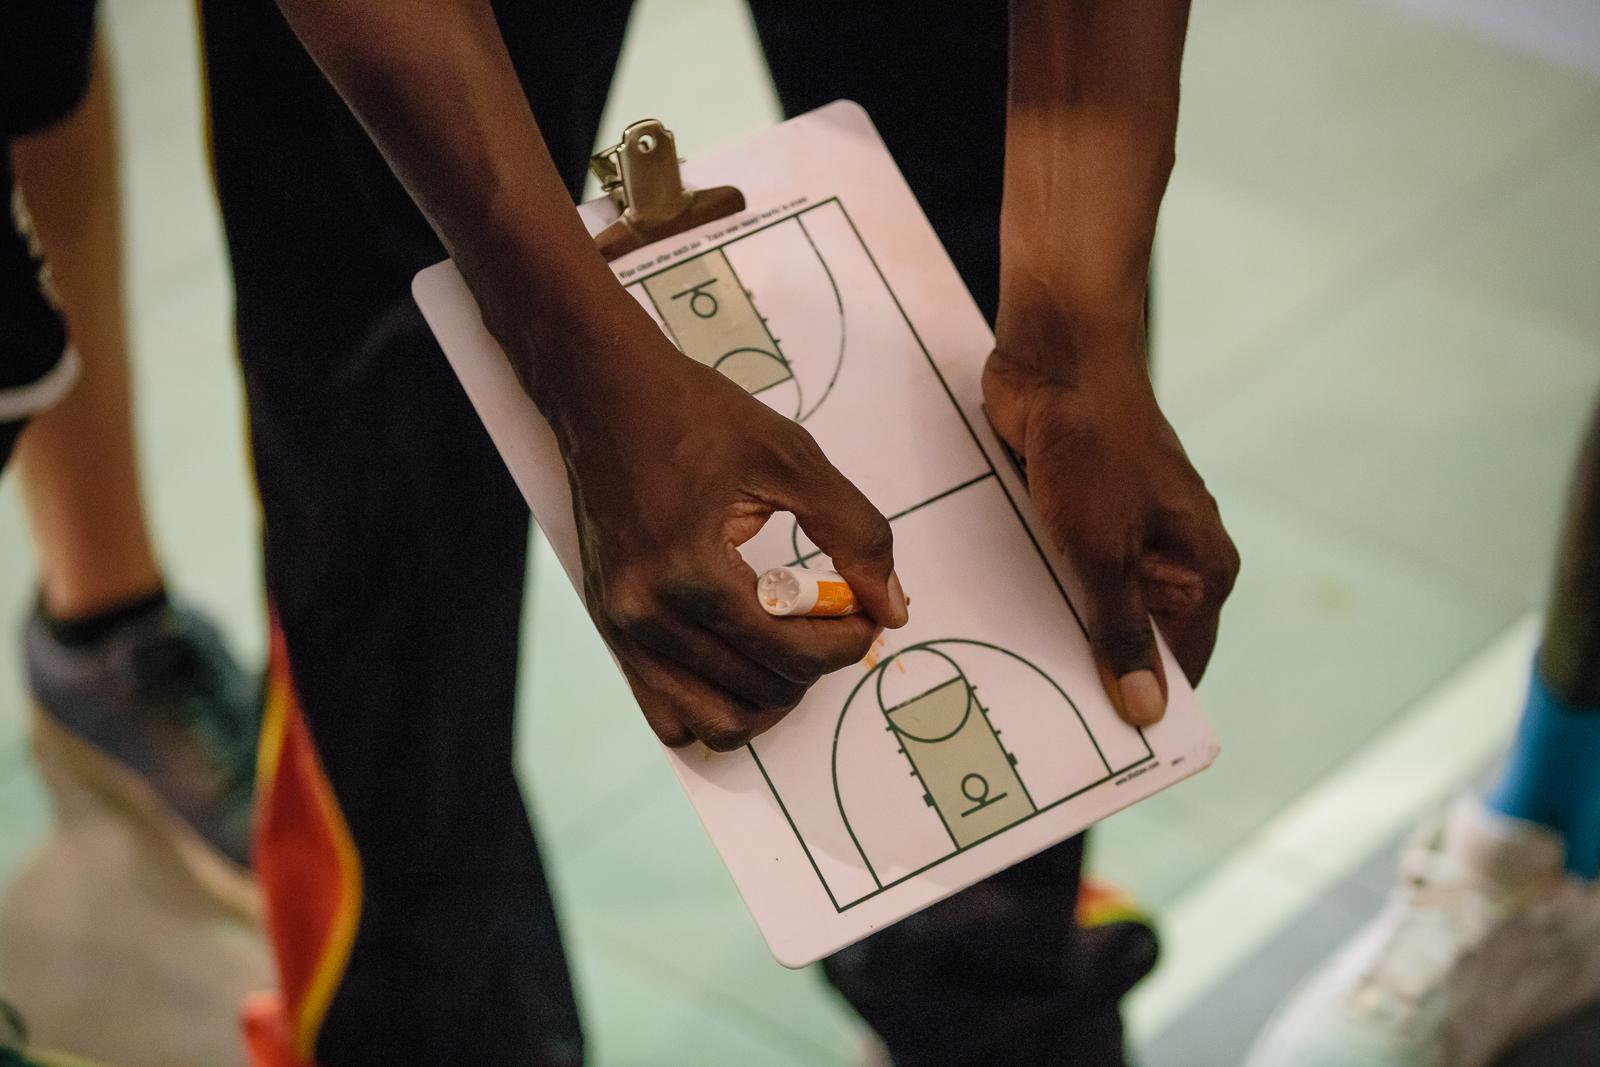 0473_20150531_Seed Academy_thiès_Senegal©KevinCouliau.jpg